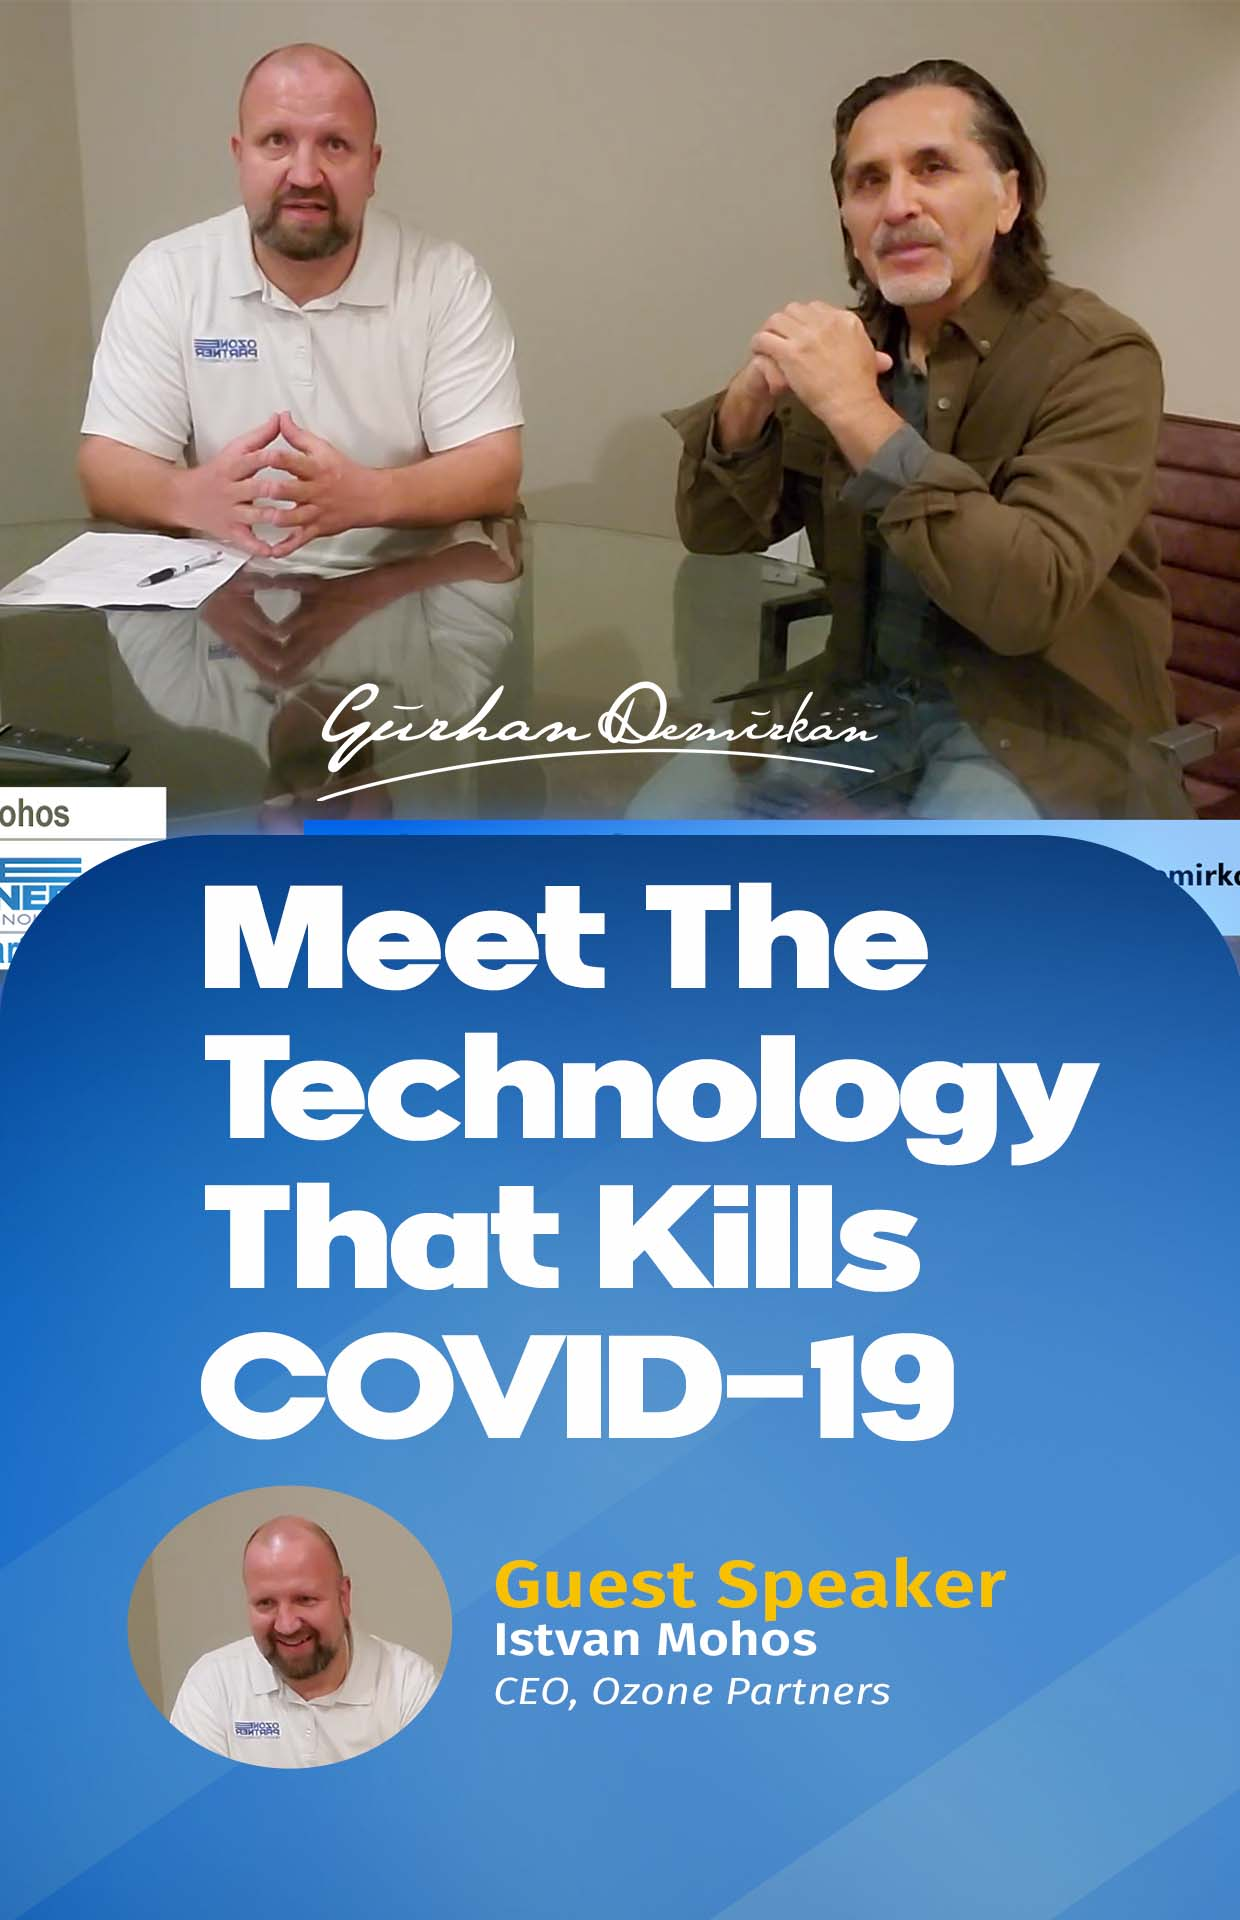 Meet The Technology That Kills COVID-19